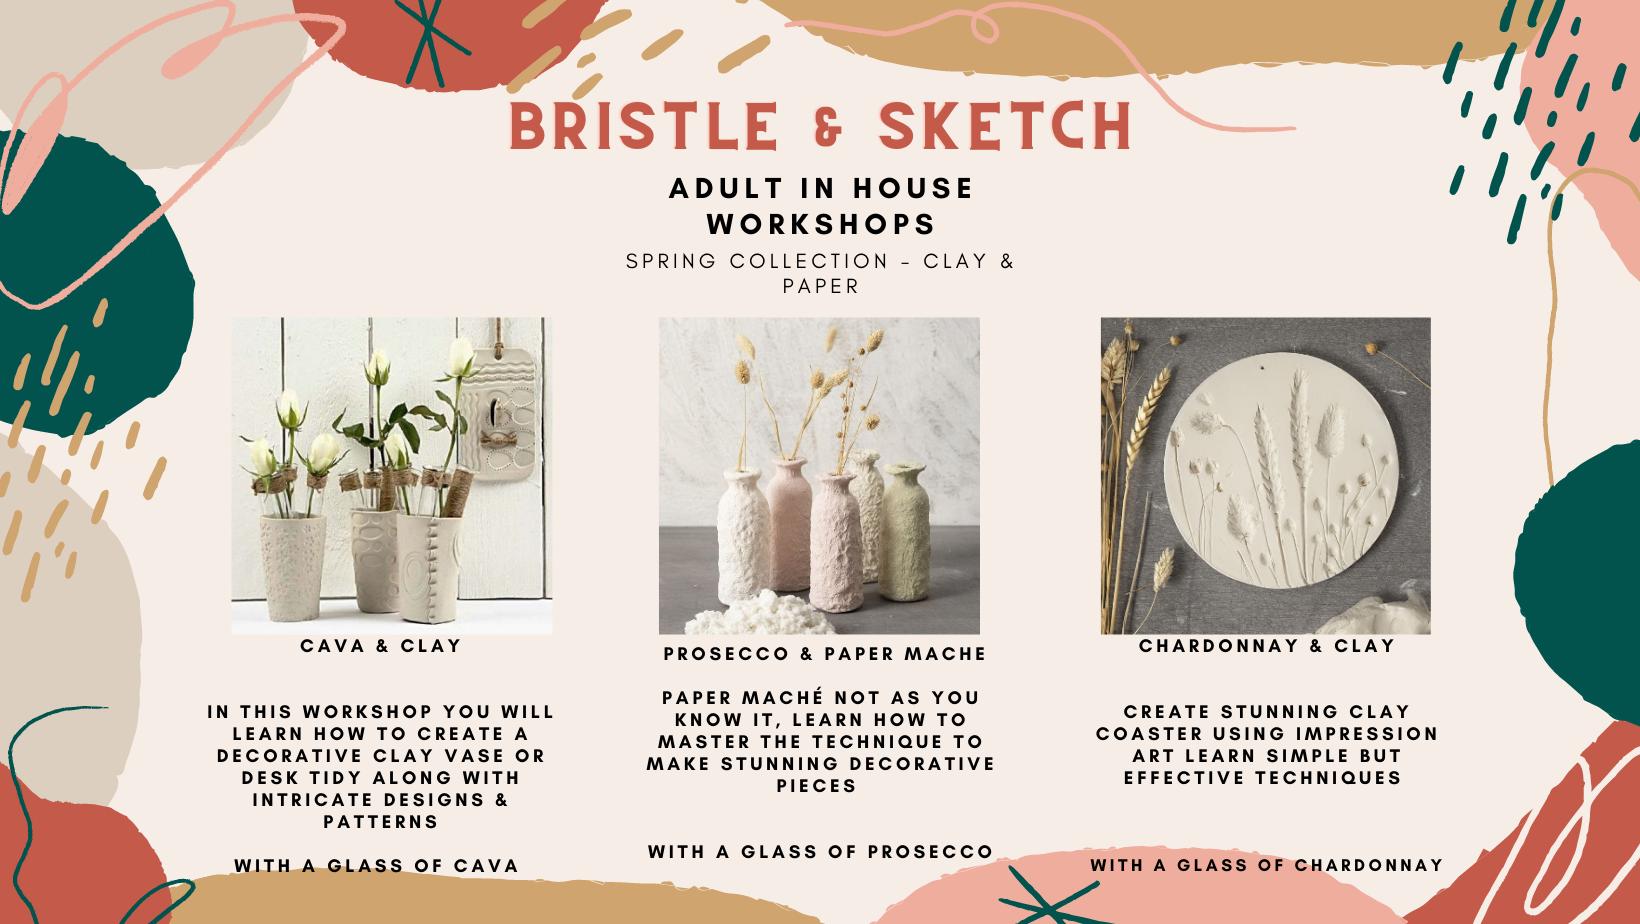 Bristle & Sketch Menu